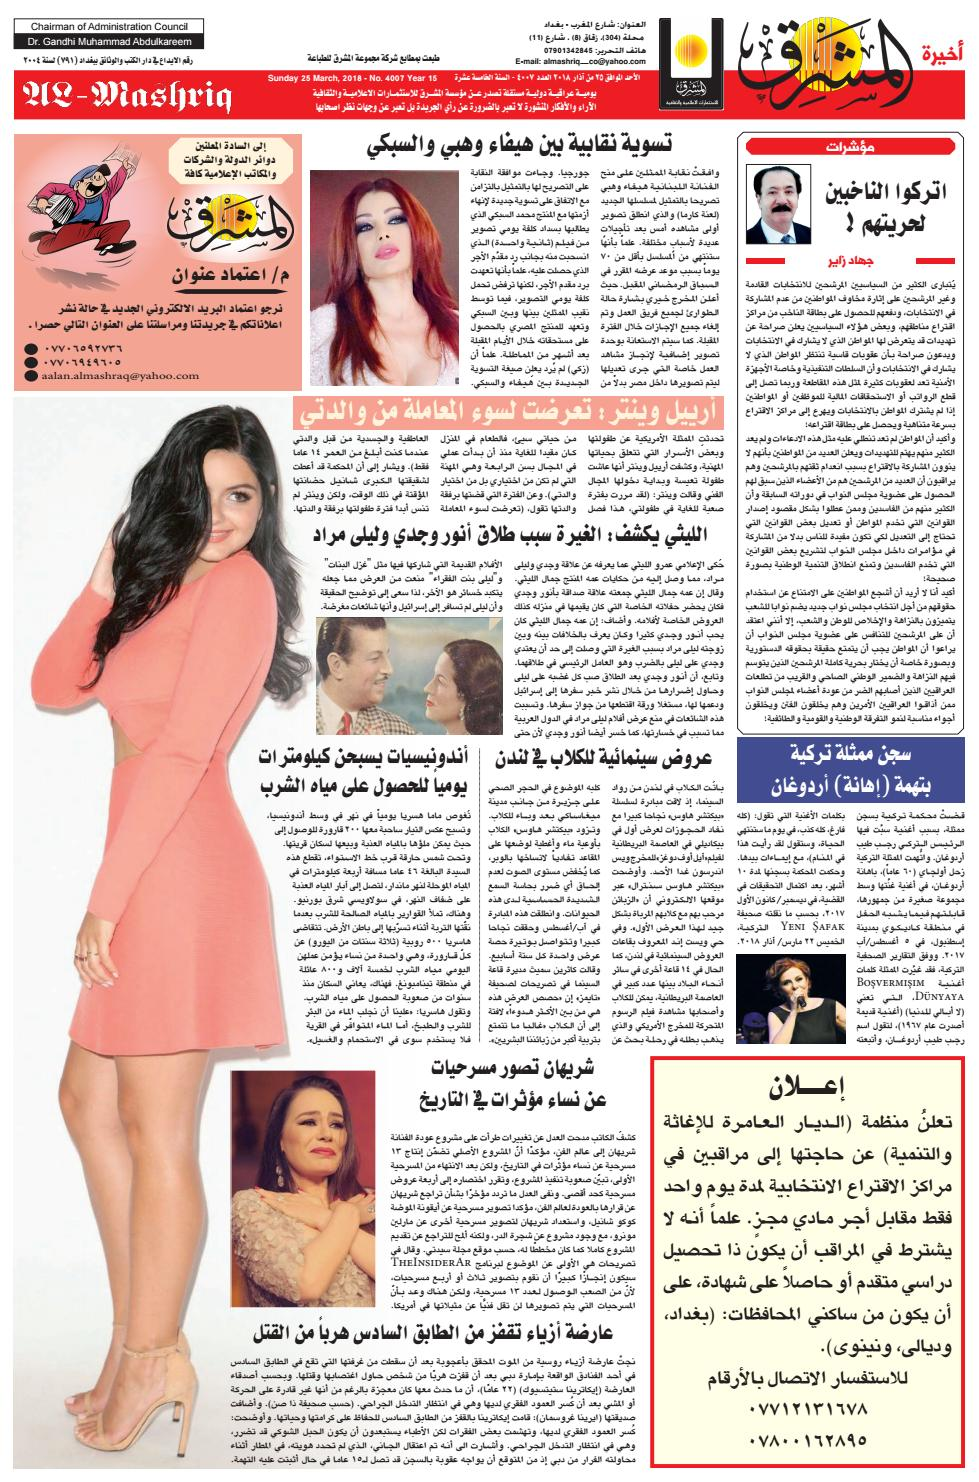 c3f8f6987 4007 AlmashriqNews by Al Mashriq Newspaper - issuu